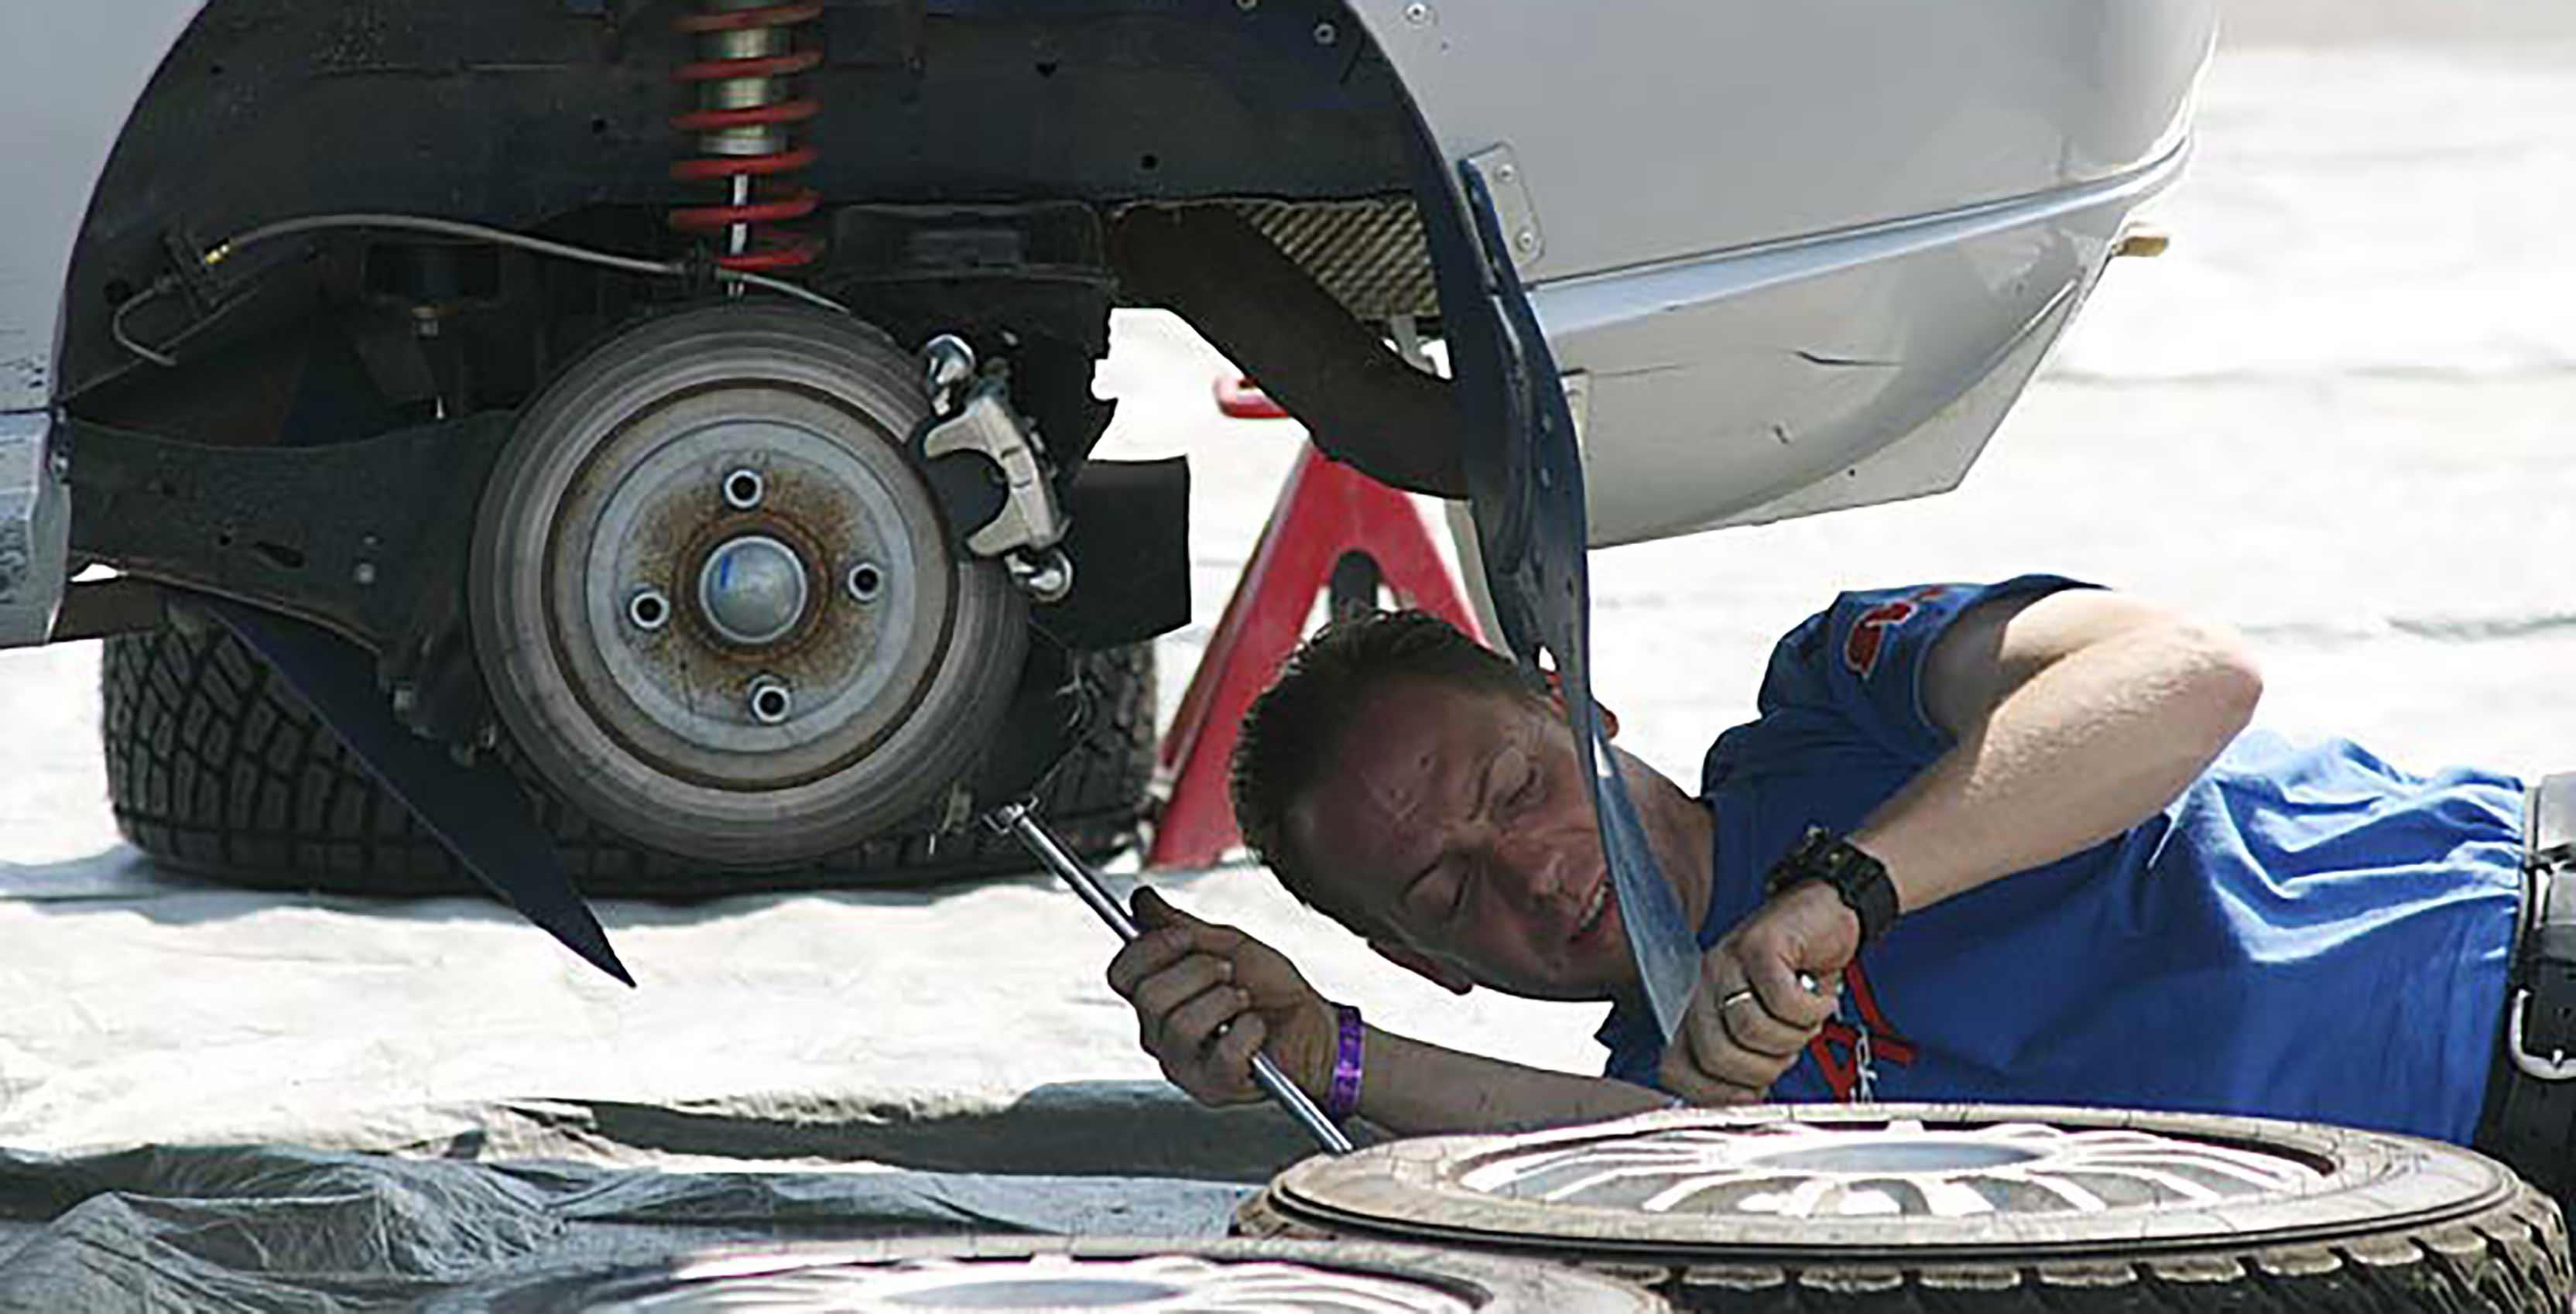 Mechanic with car